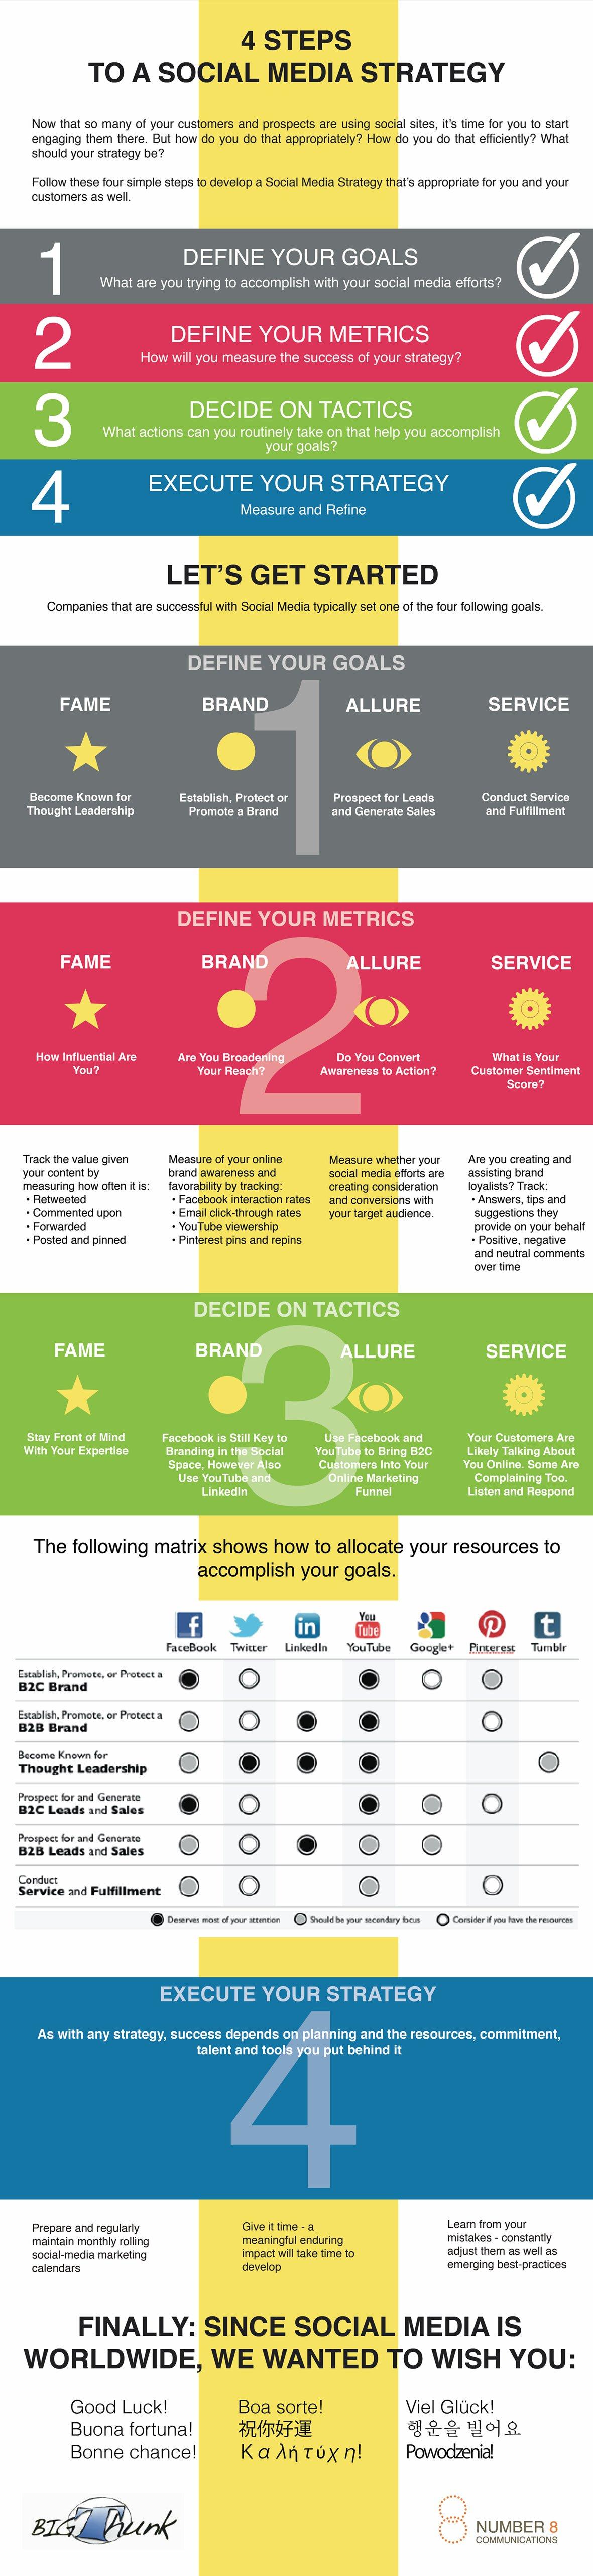 4 Adımda Sosyal Medya Stratejisi